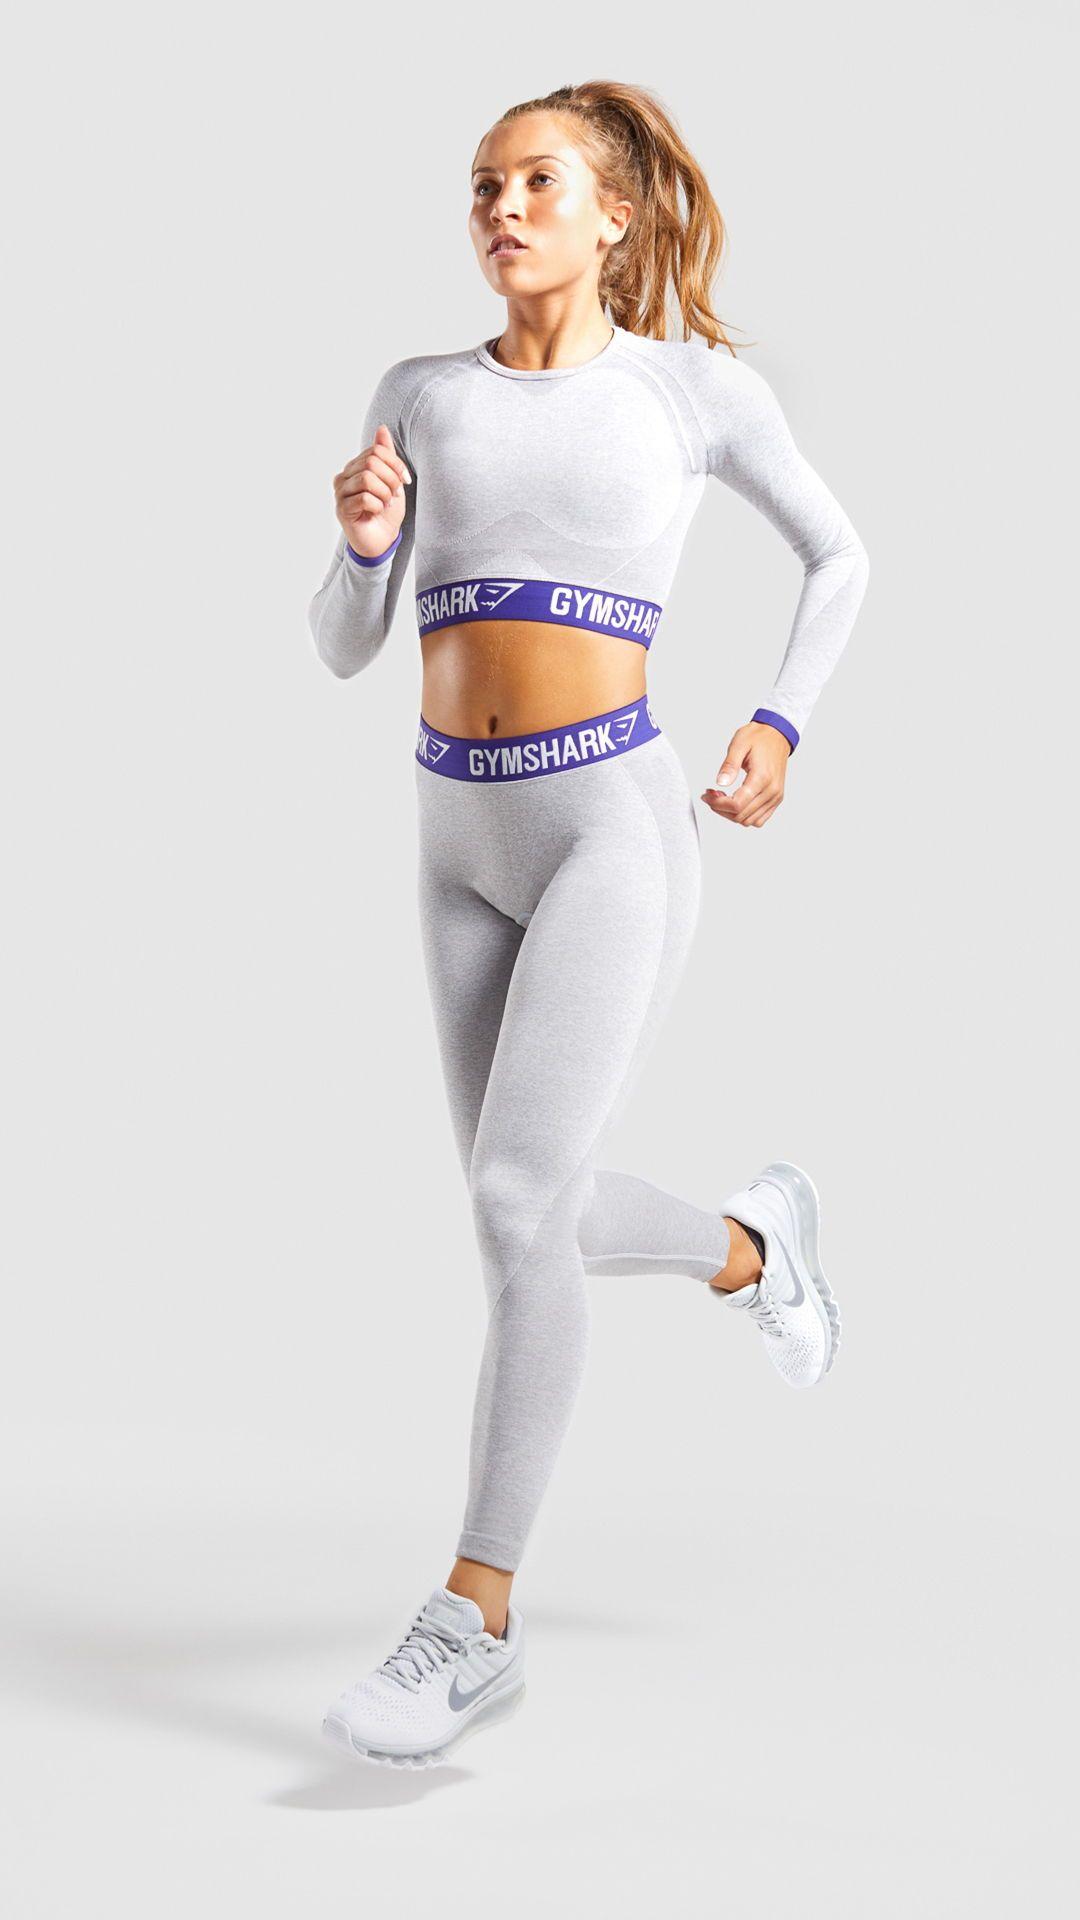 05332f2653e38 The Gymshark Flex Long Sleeve Crop Top, Light Grey Marl/ Indigo. Our model  is 5